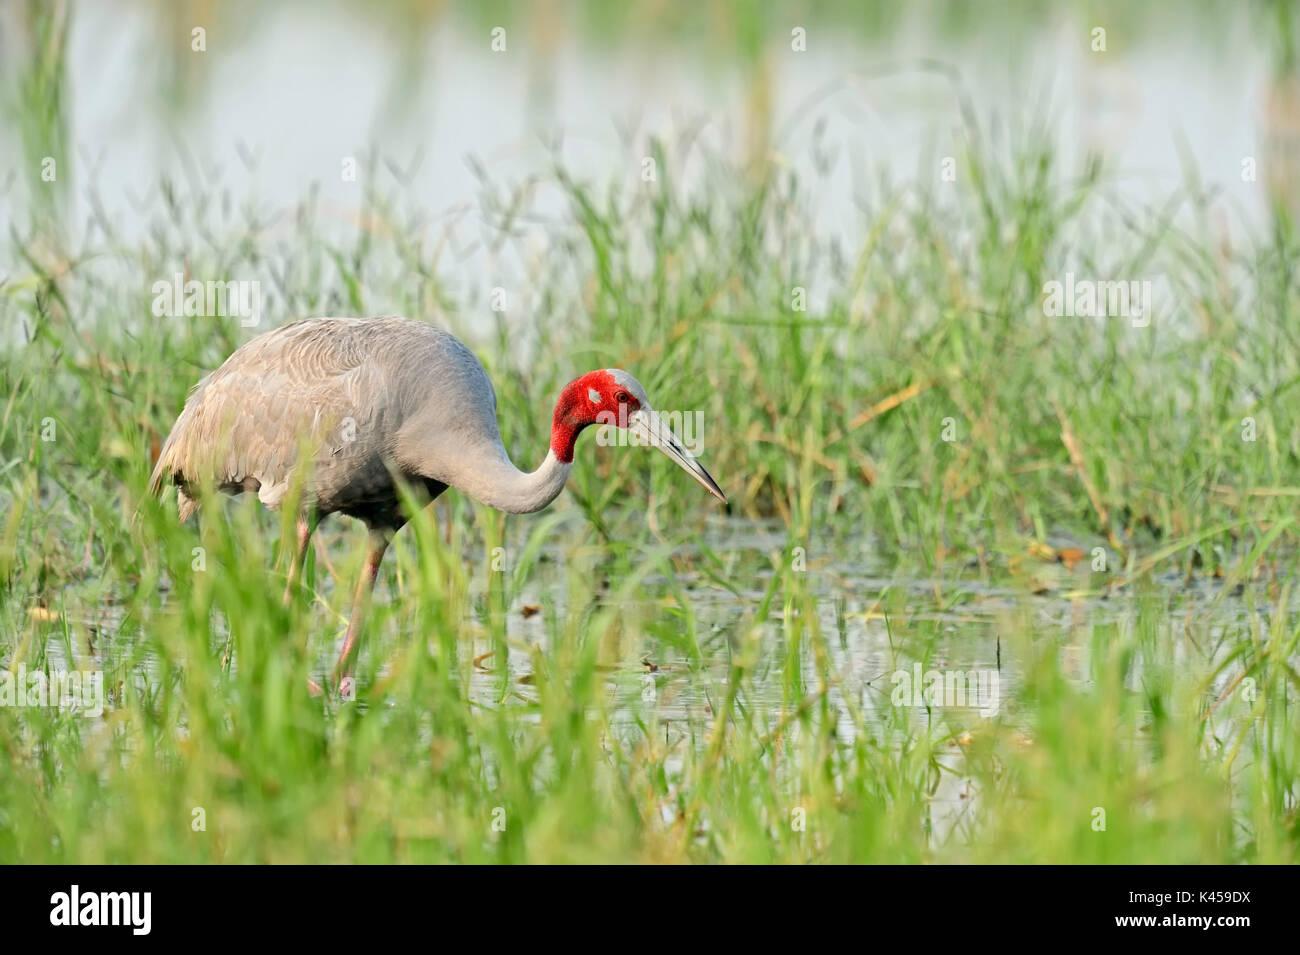 Sarus Crane, Rajasthan, Indien/(Grus Antigone) | Saruskranich, Rajasthan, Indien/(Grus Antigone) Stockbild